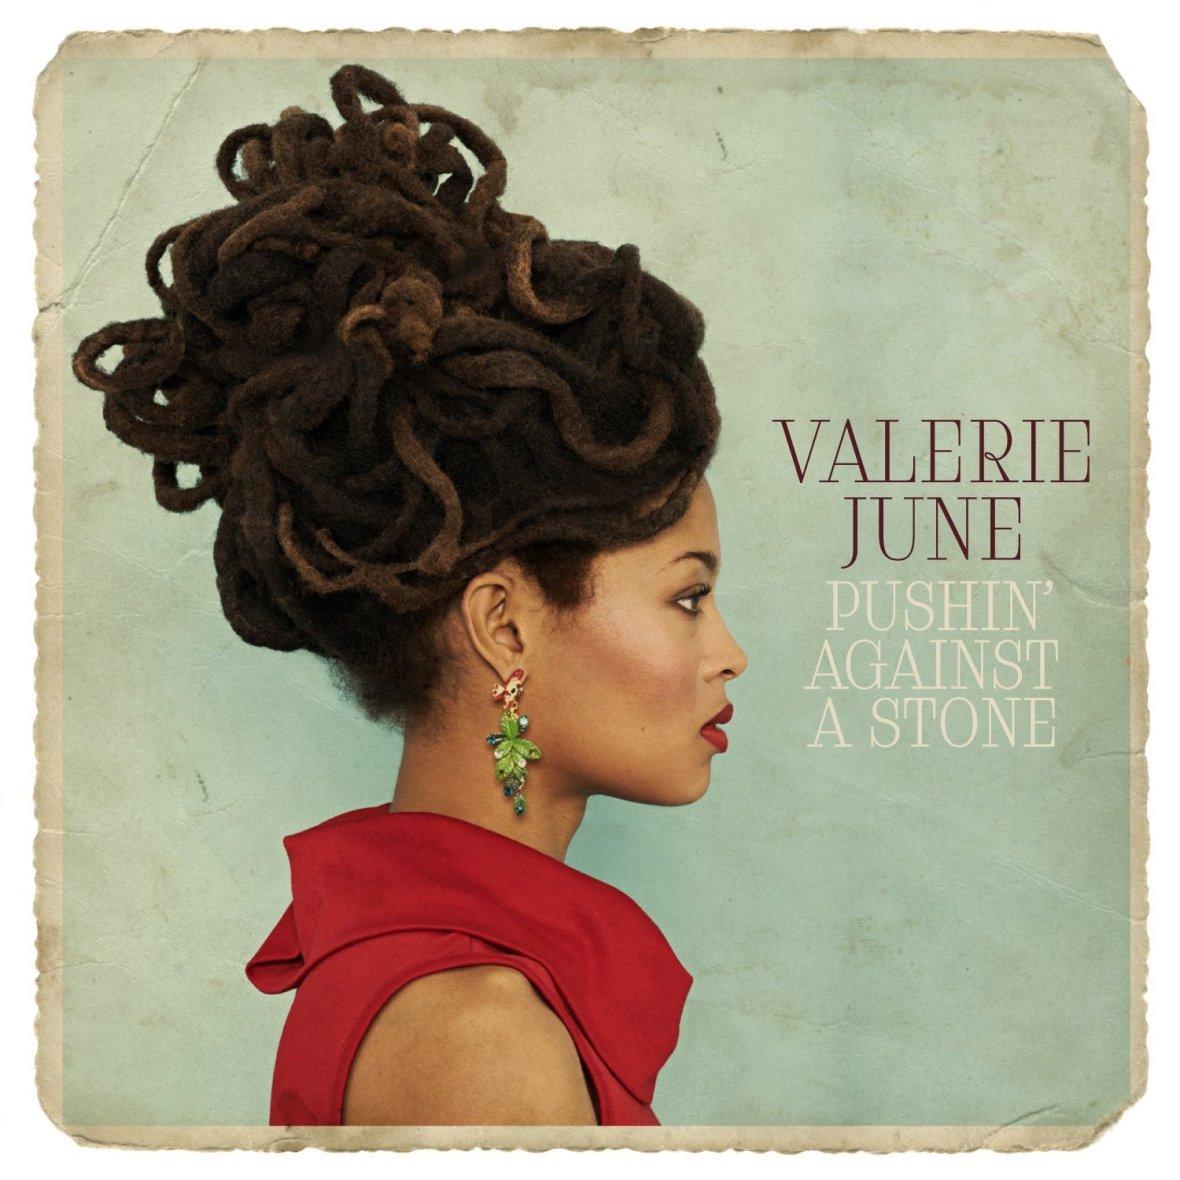 valerie-june-pushin-against-a-stone_0